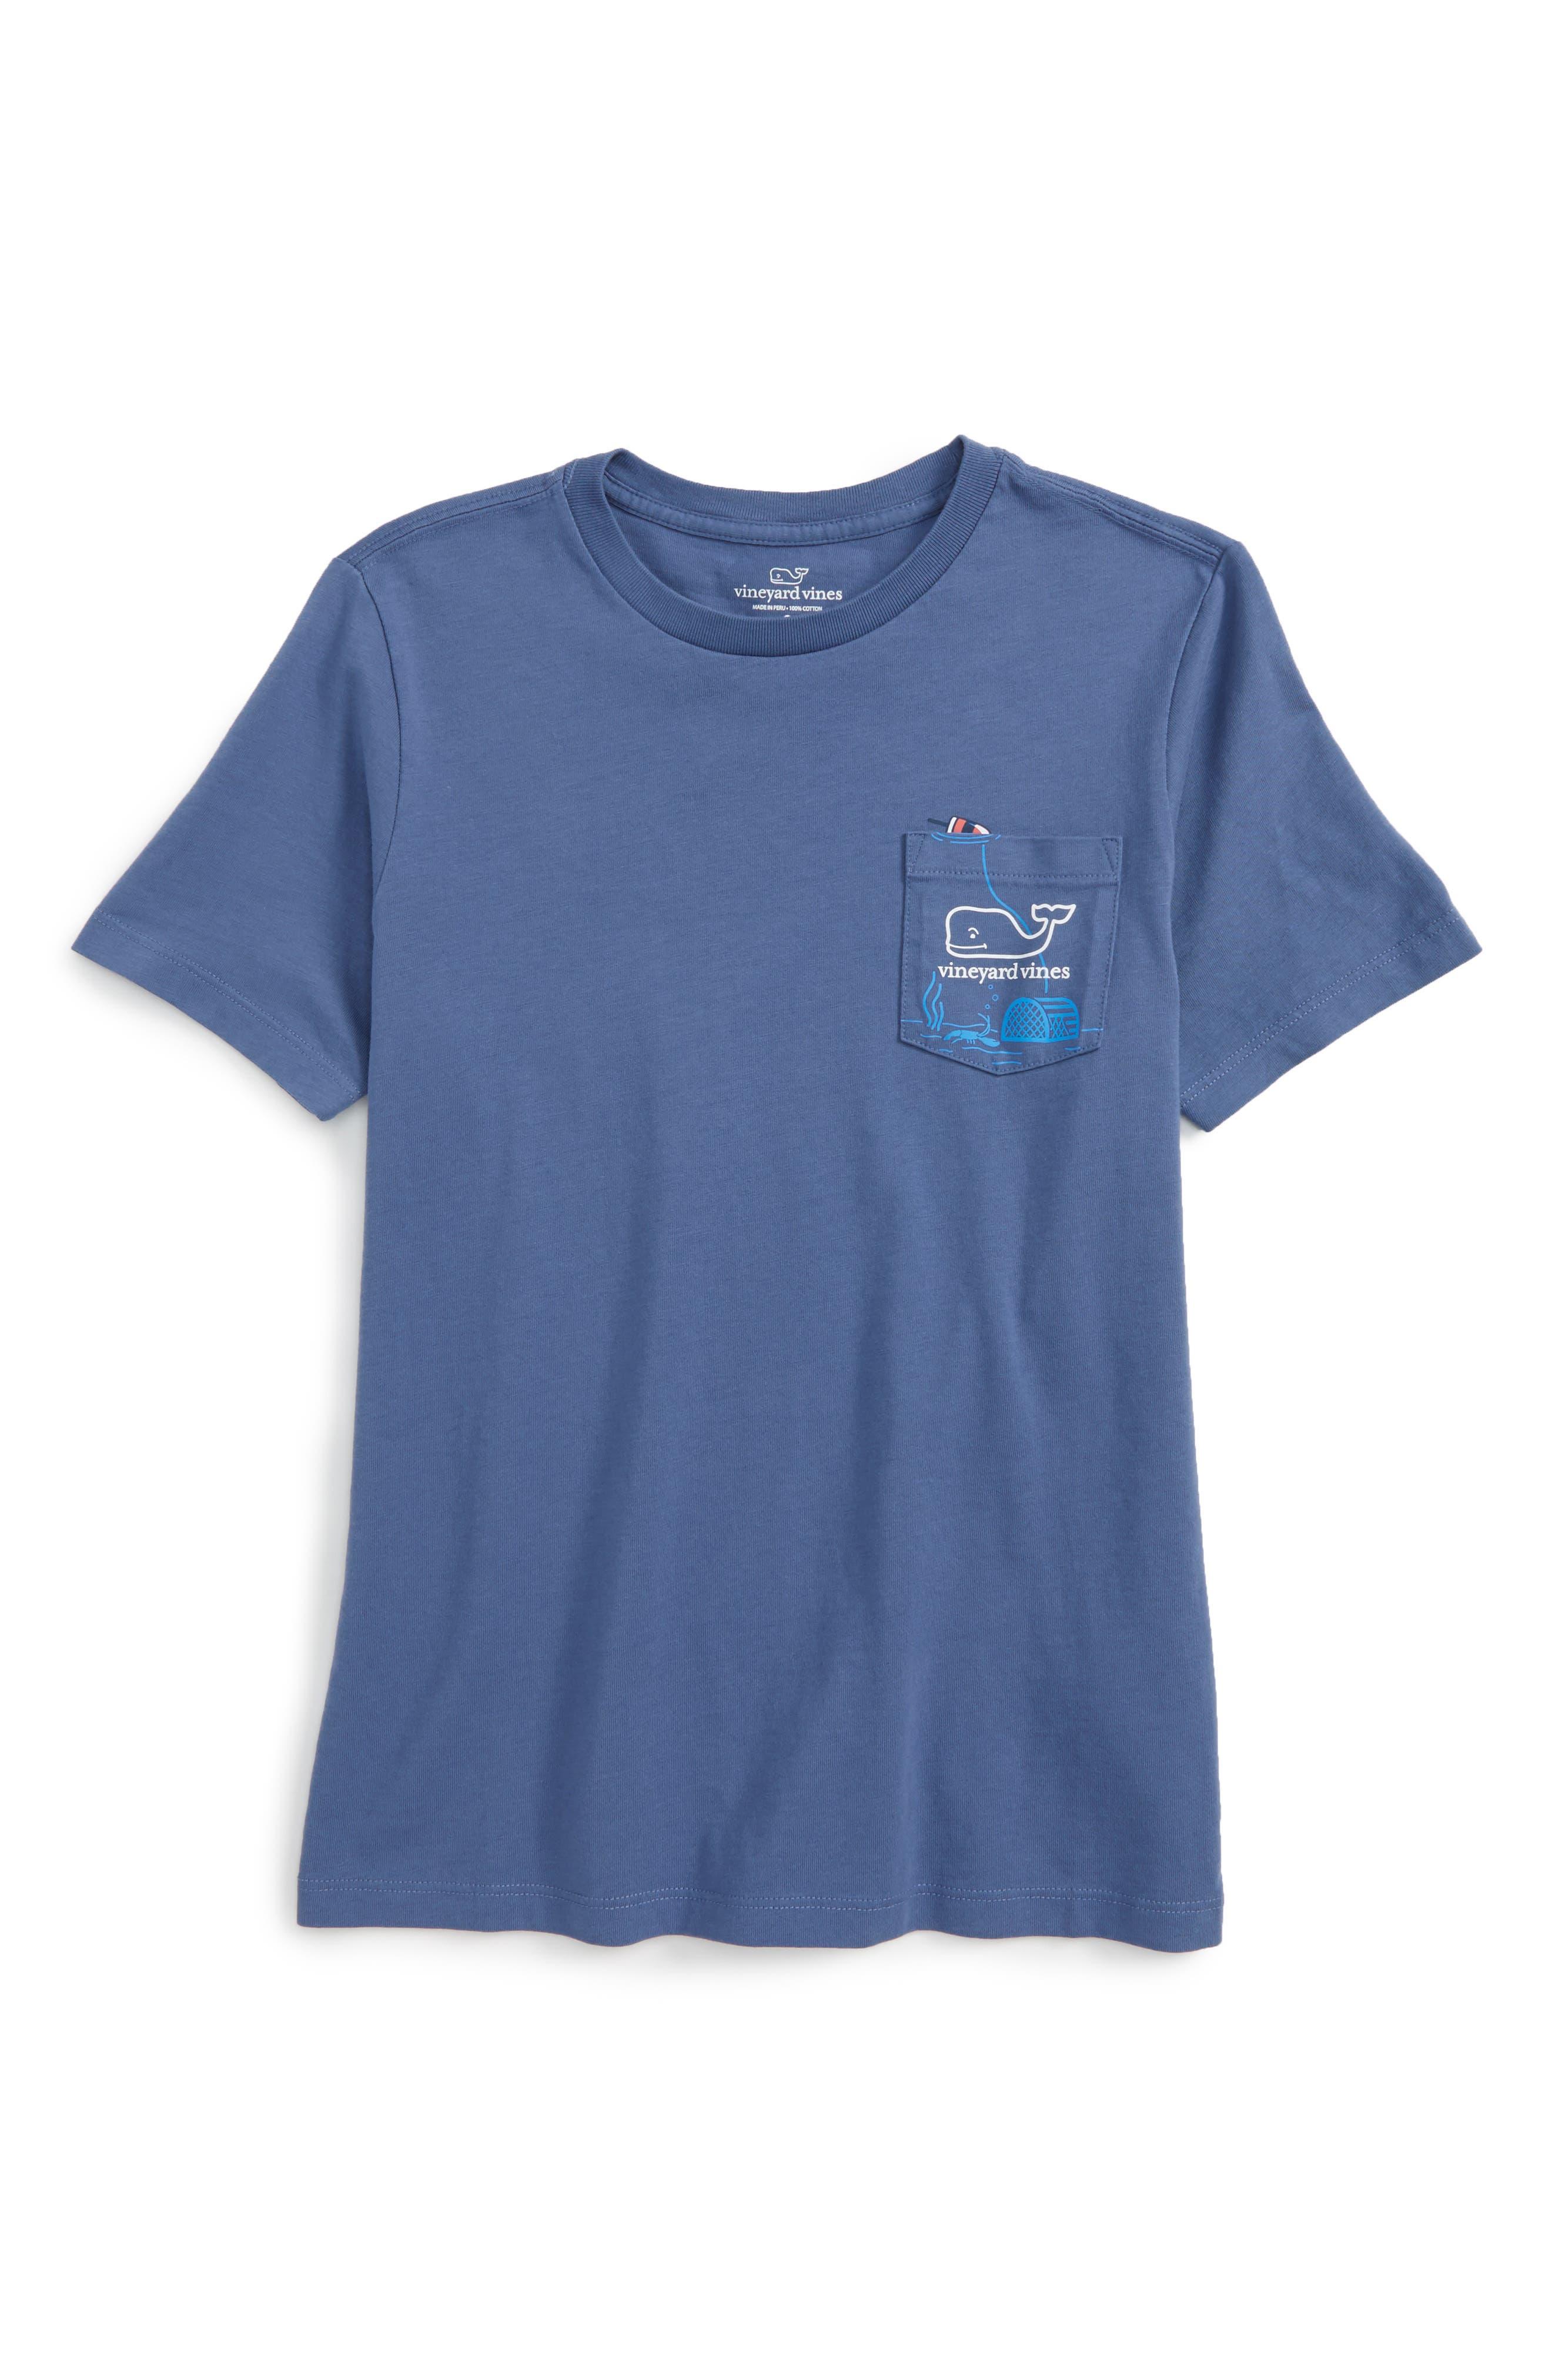 vineyard vines Lobster Trap Cotton T-Shirt (Big Boys)